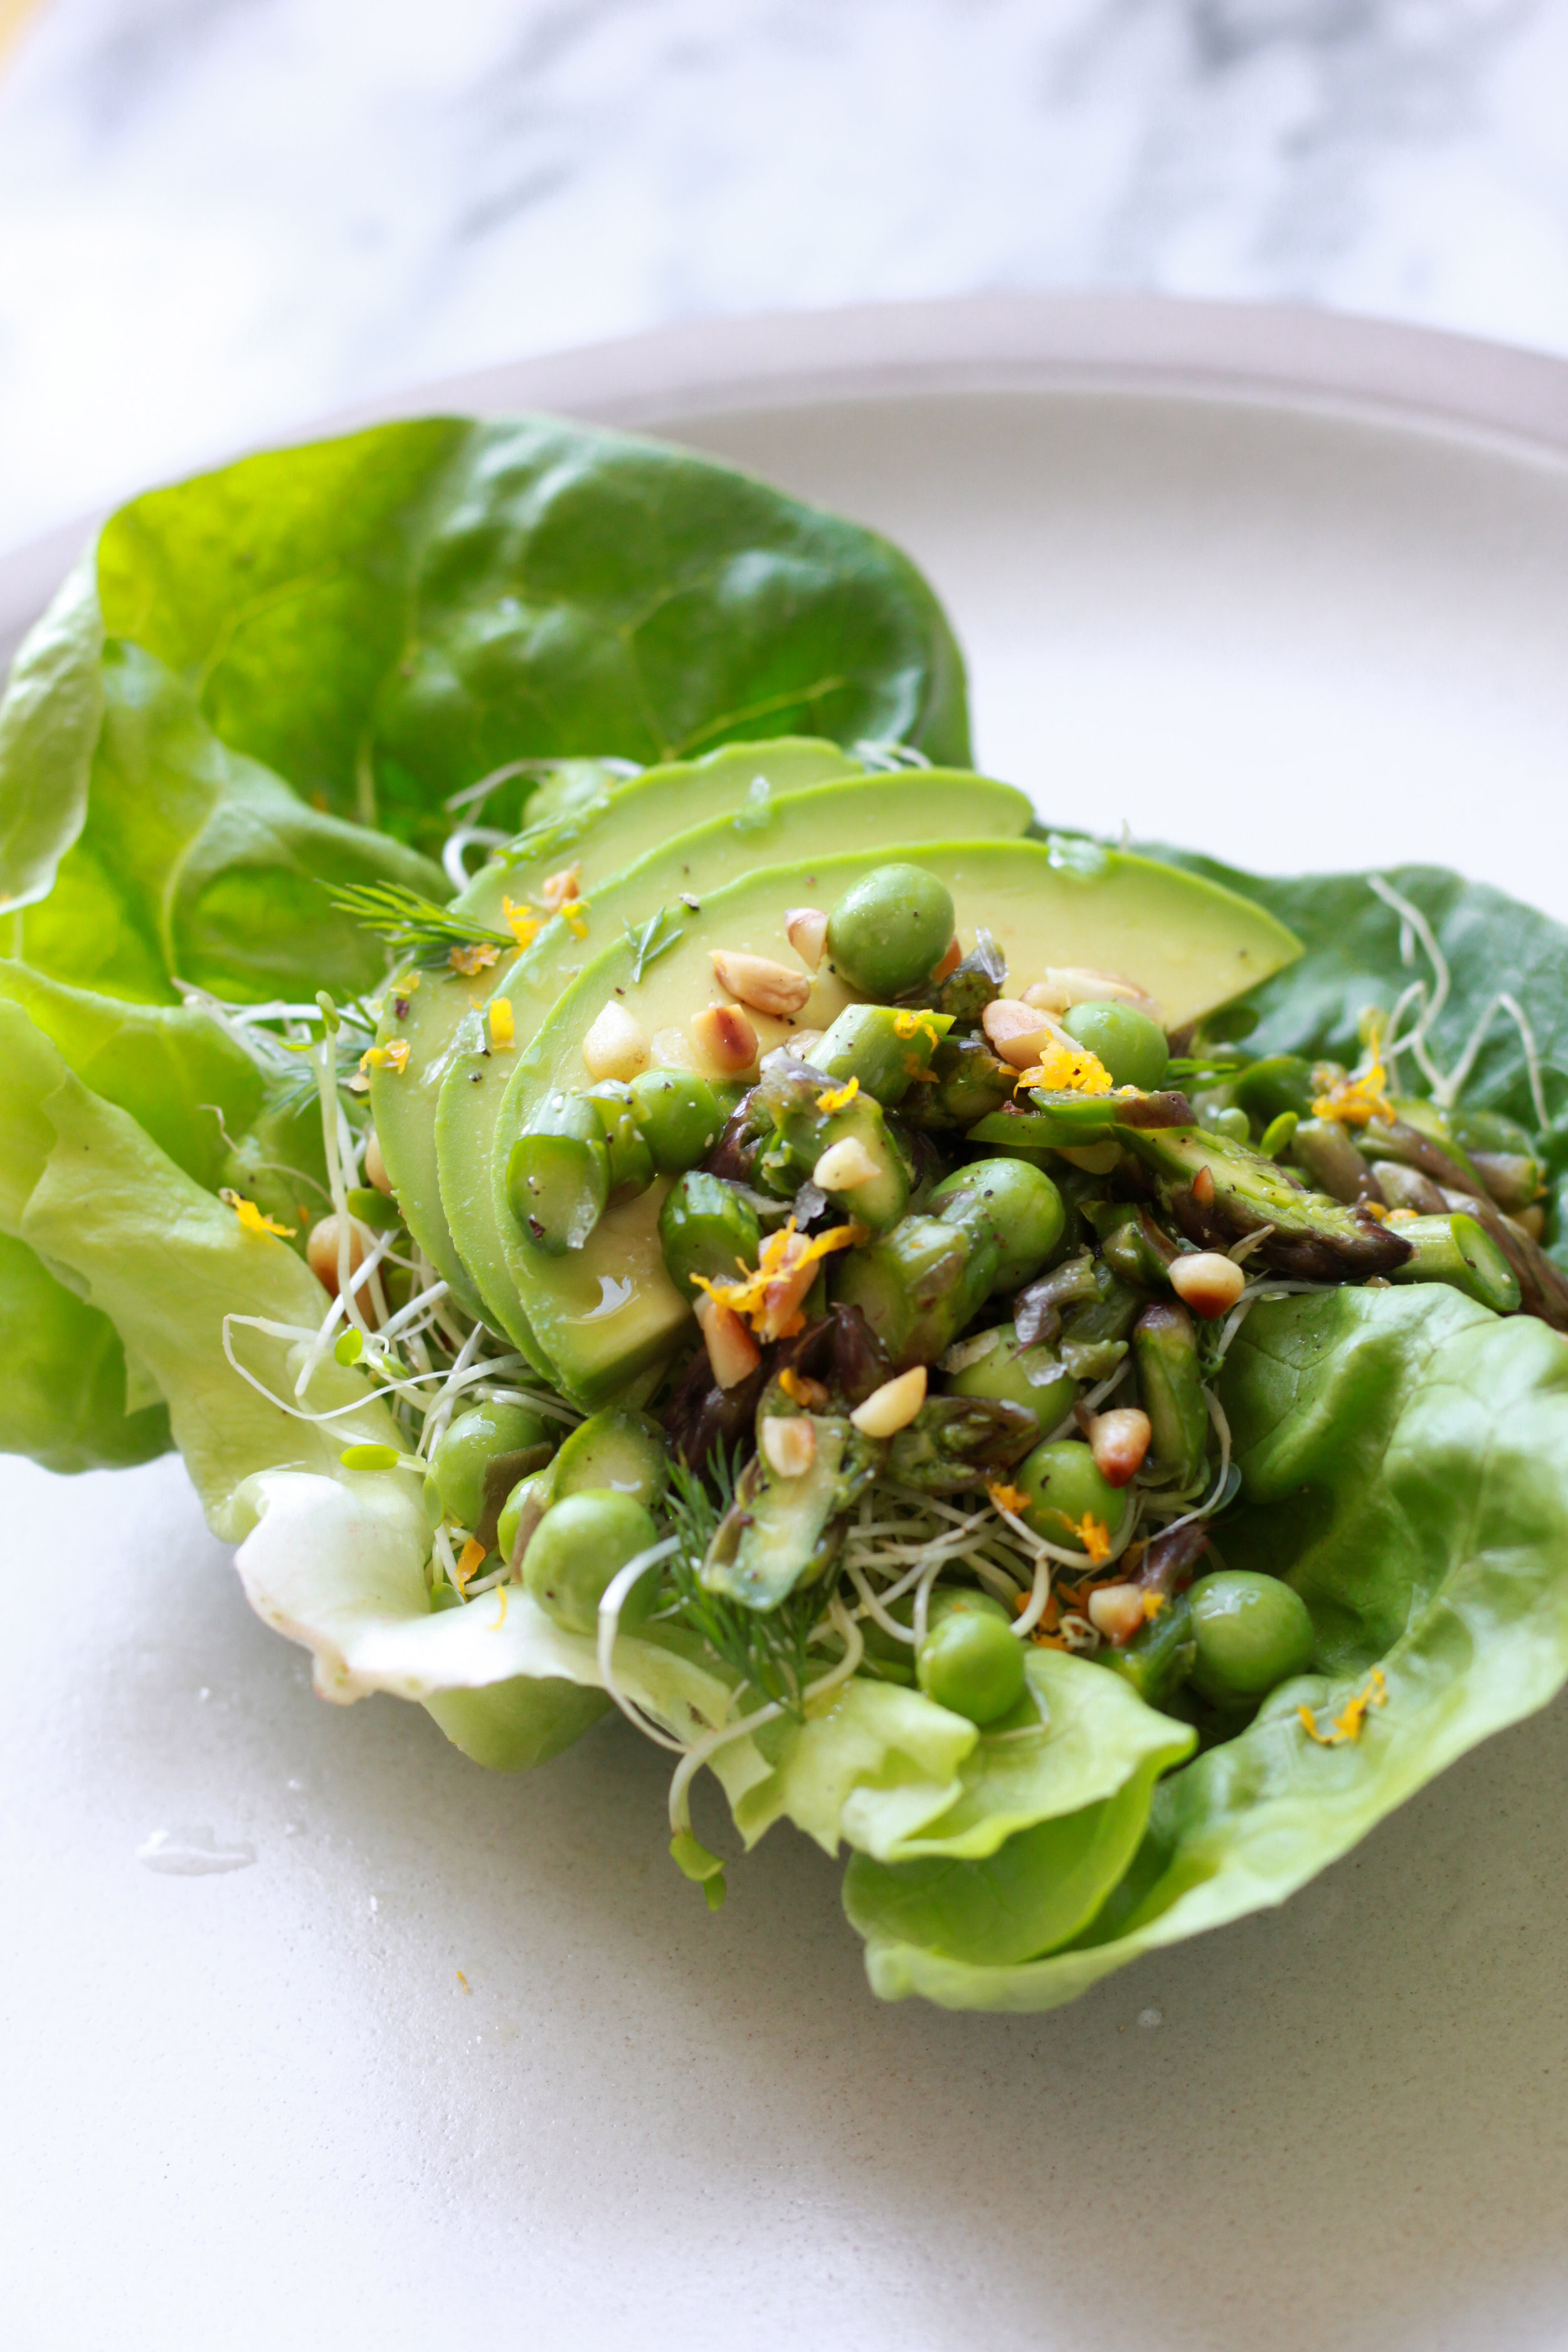 lettucecup3.jpg